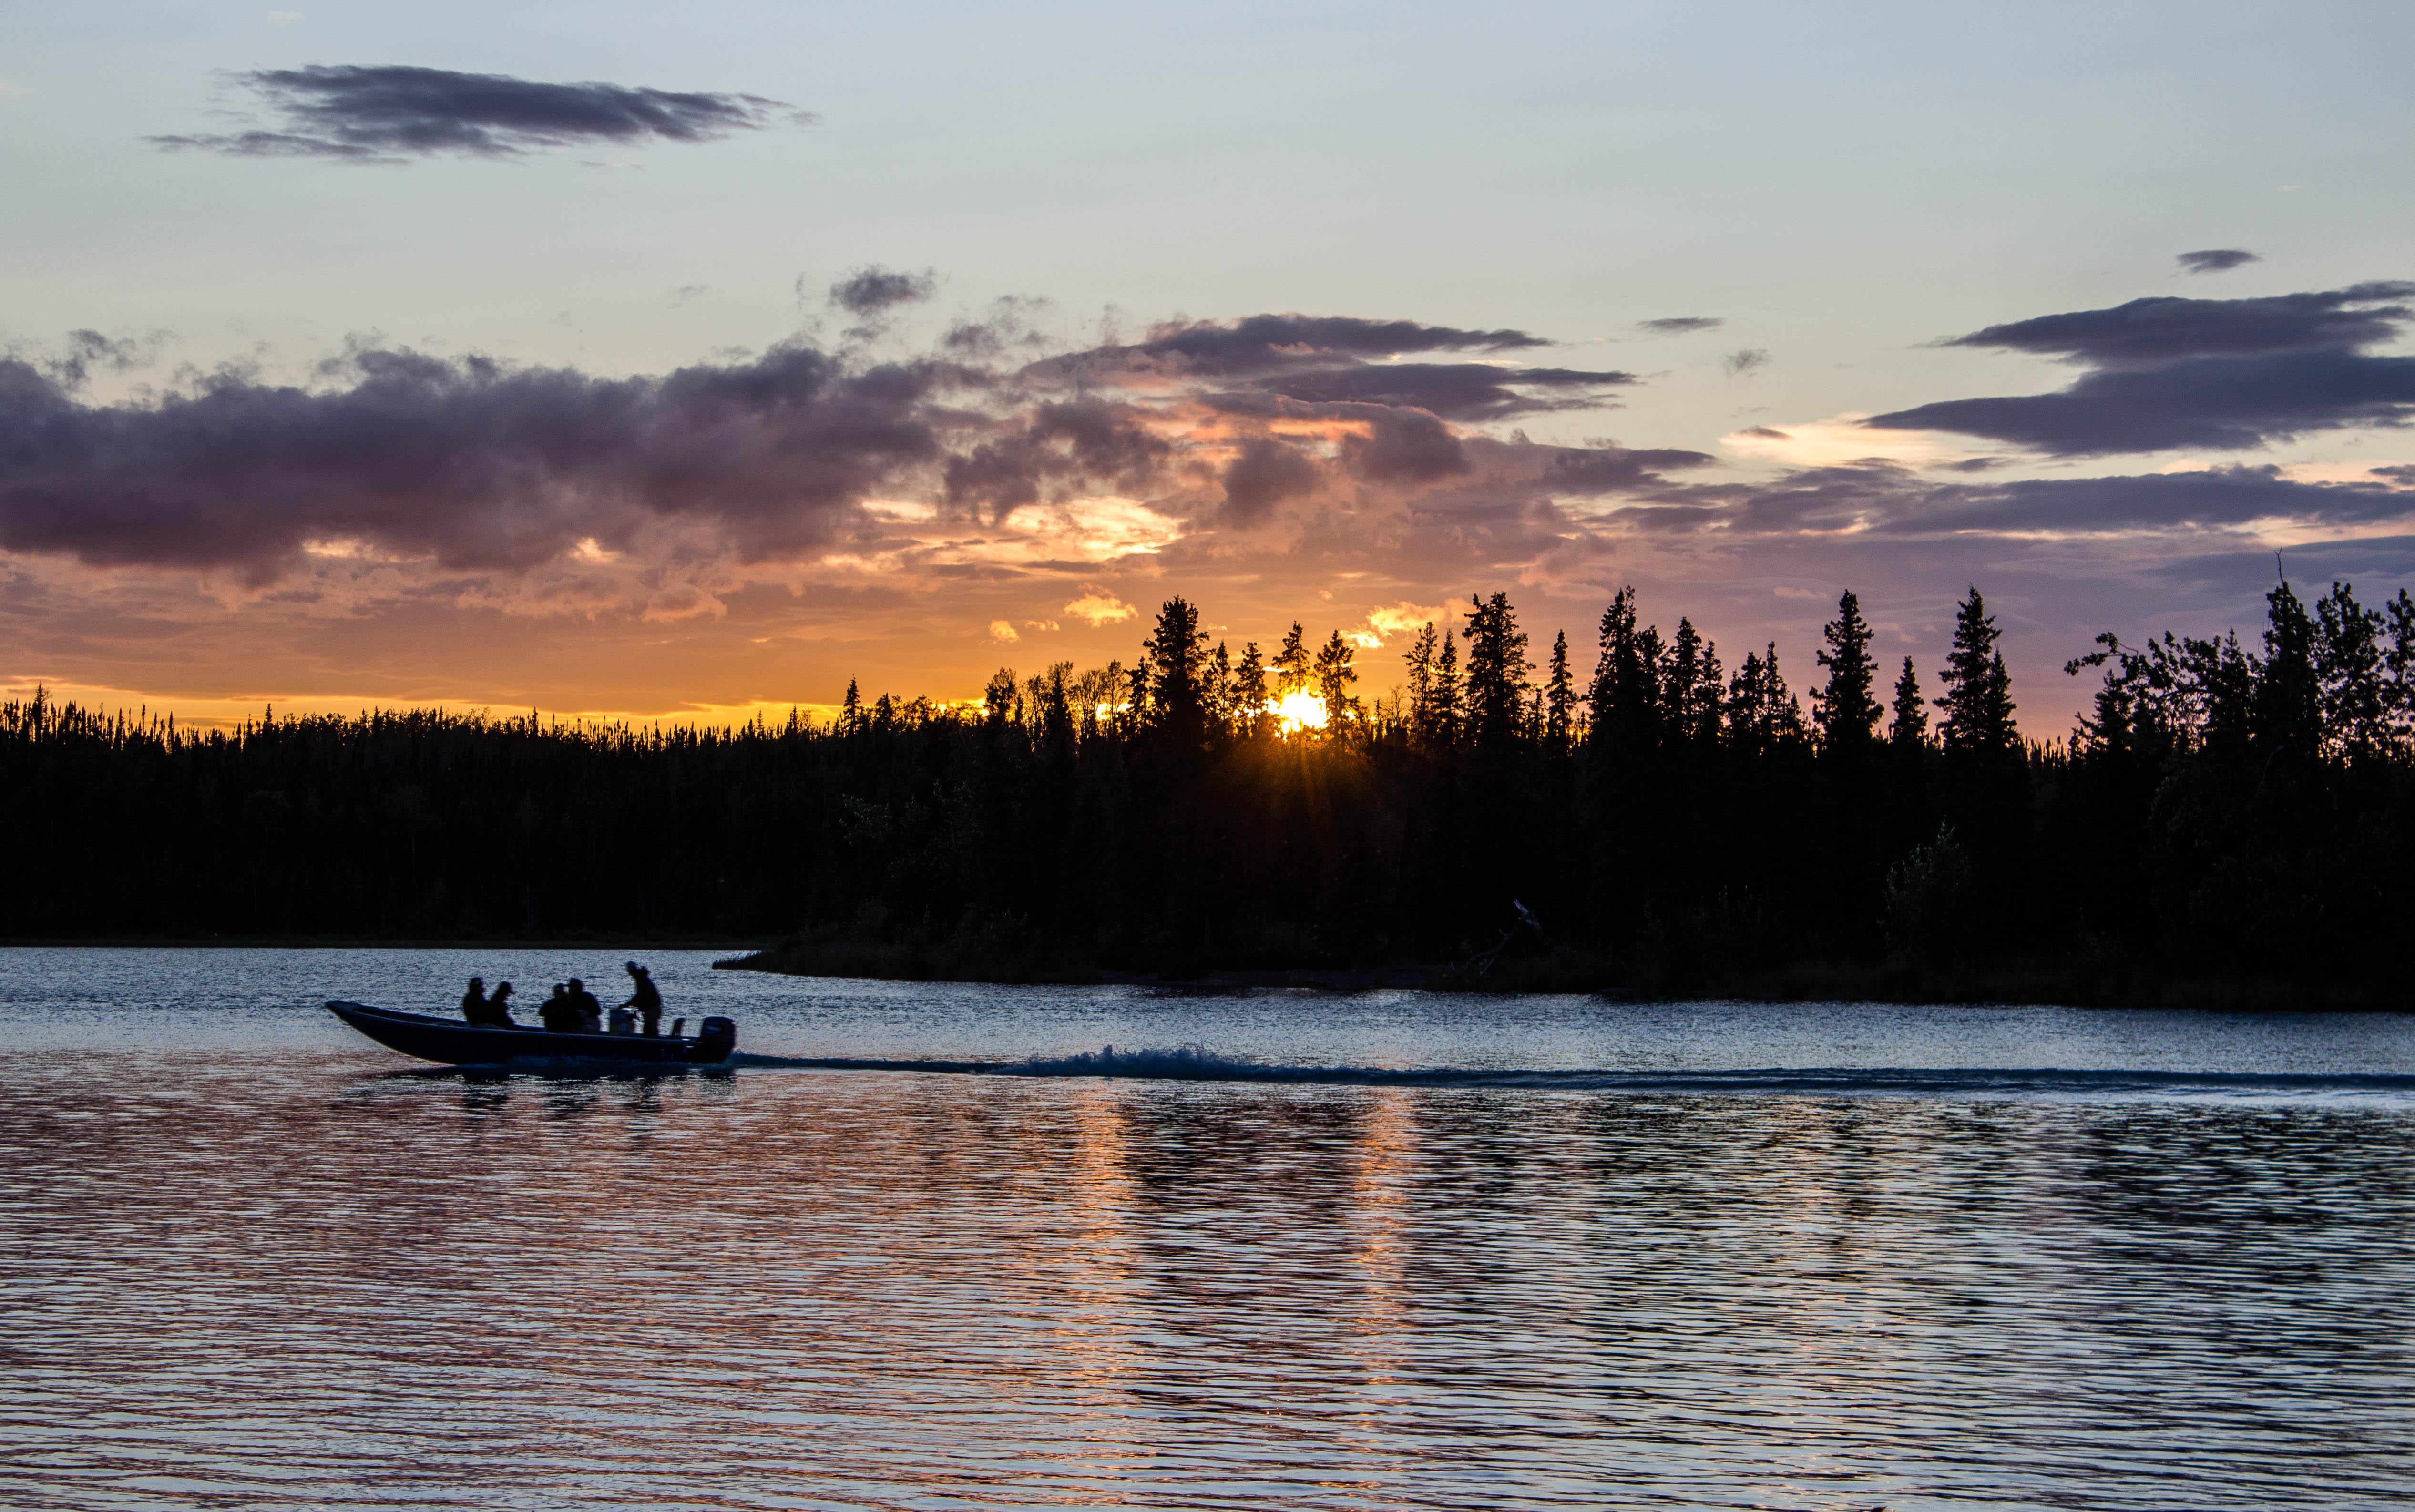 People go fishing at sunset along the Kenai River in Alaska. Shutterstock image via user Amber Walker